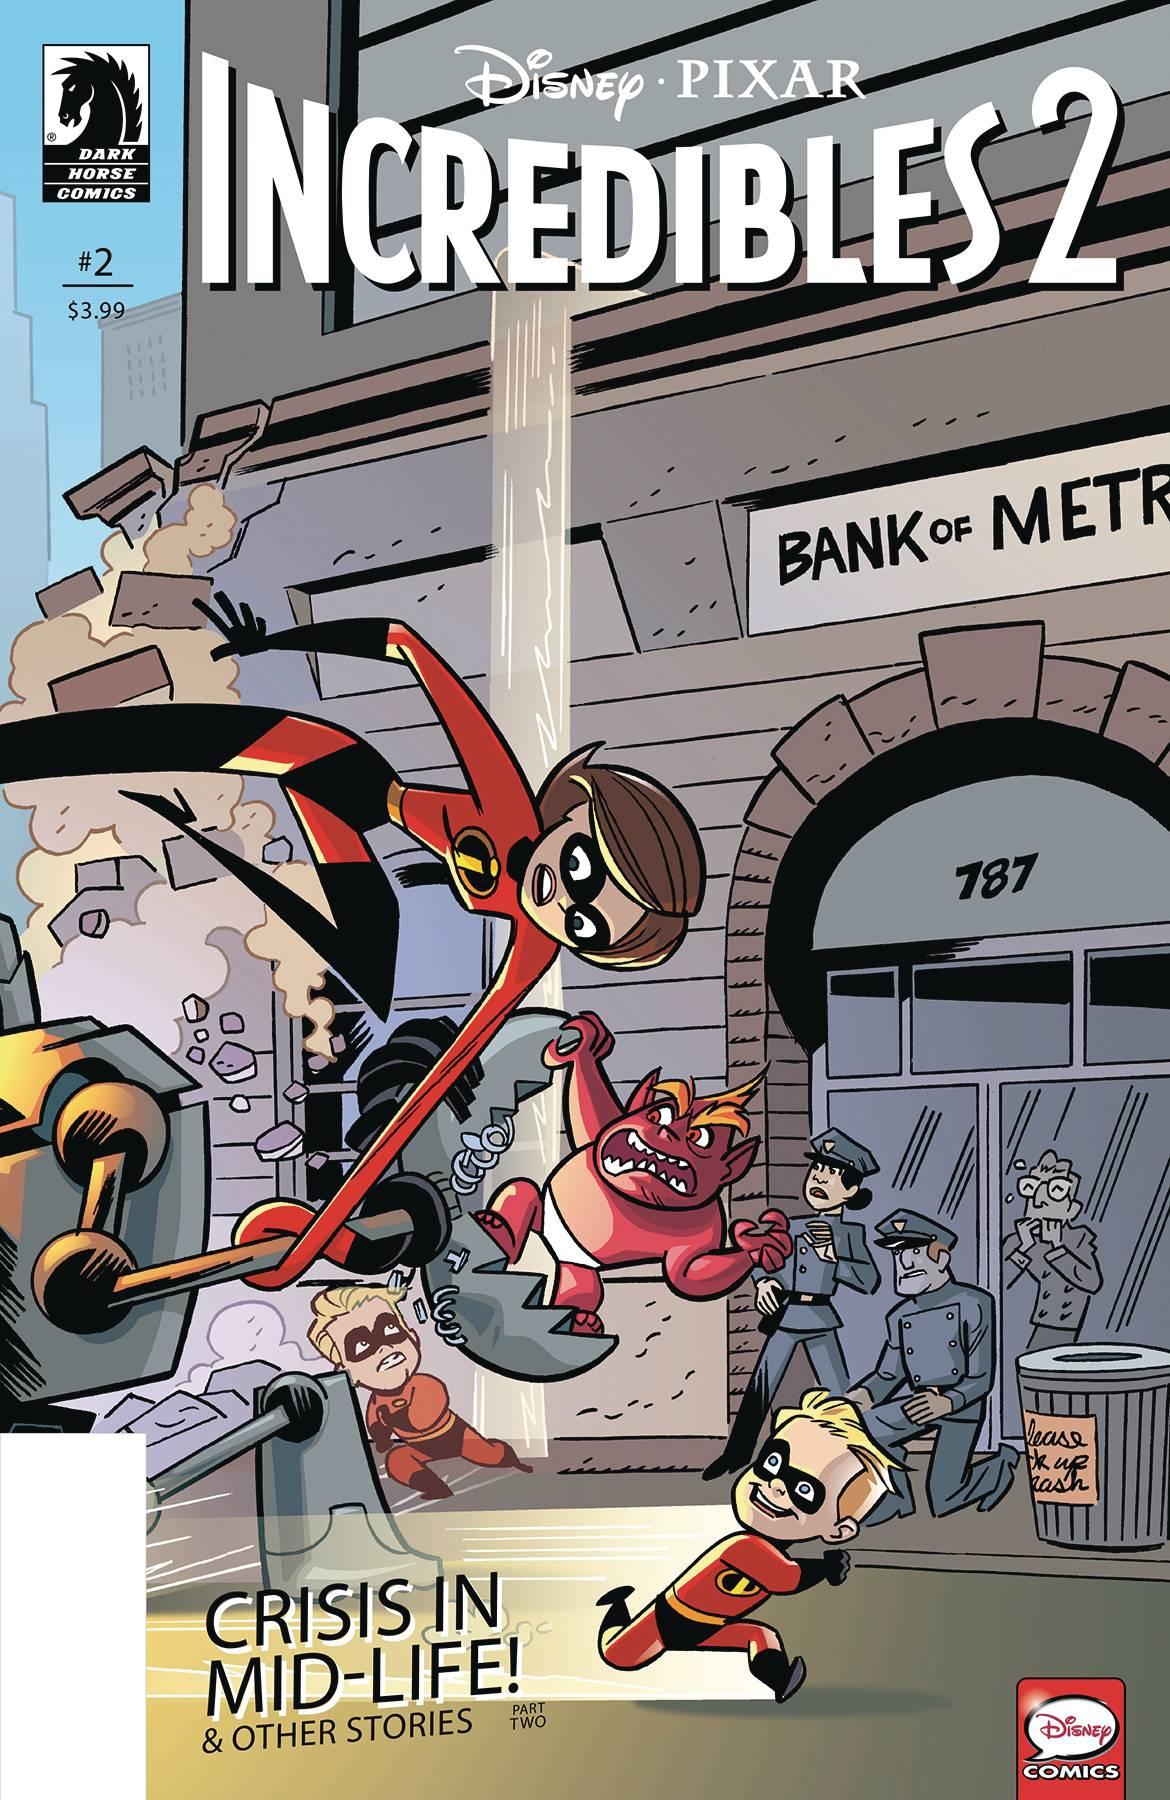 Disney Pixar: Incredibles 2 #2 (Crisis Midlife & Other Stories) (Cover B)